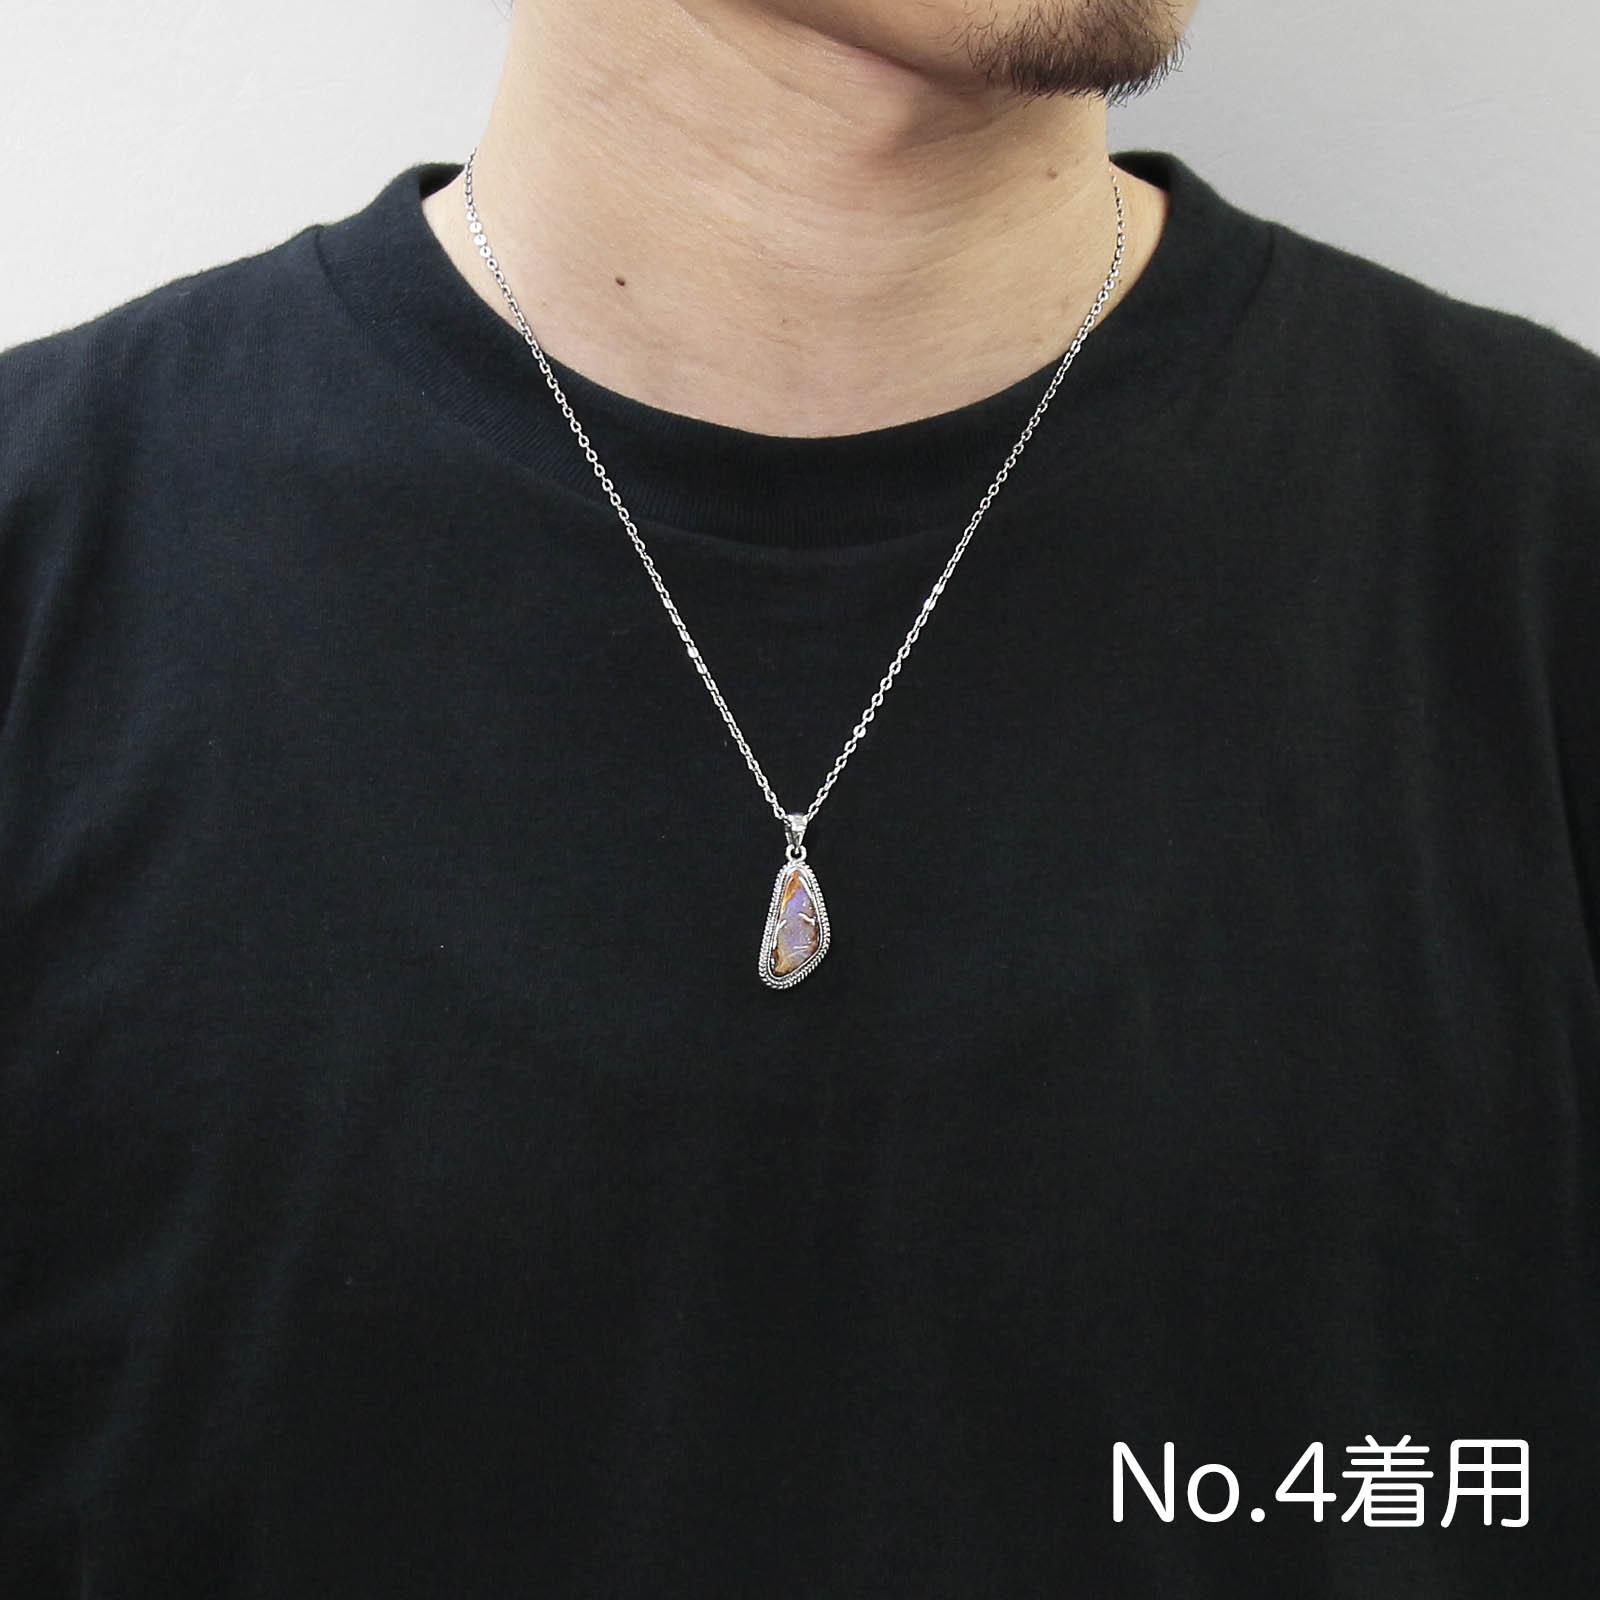 Large Opal Stone Necklace